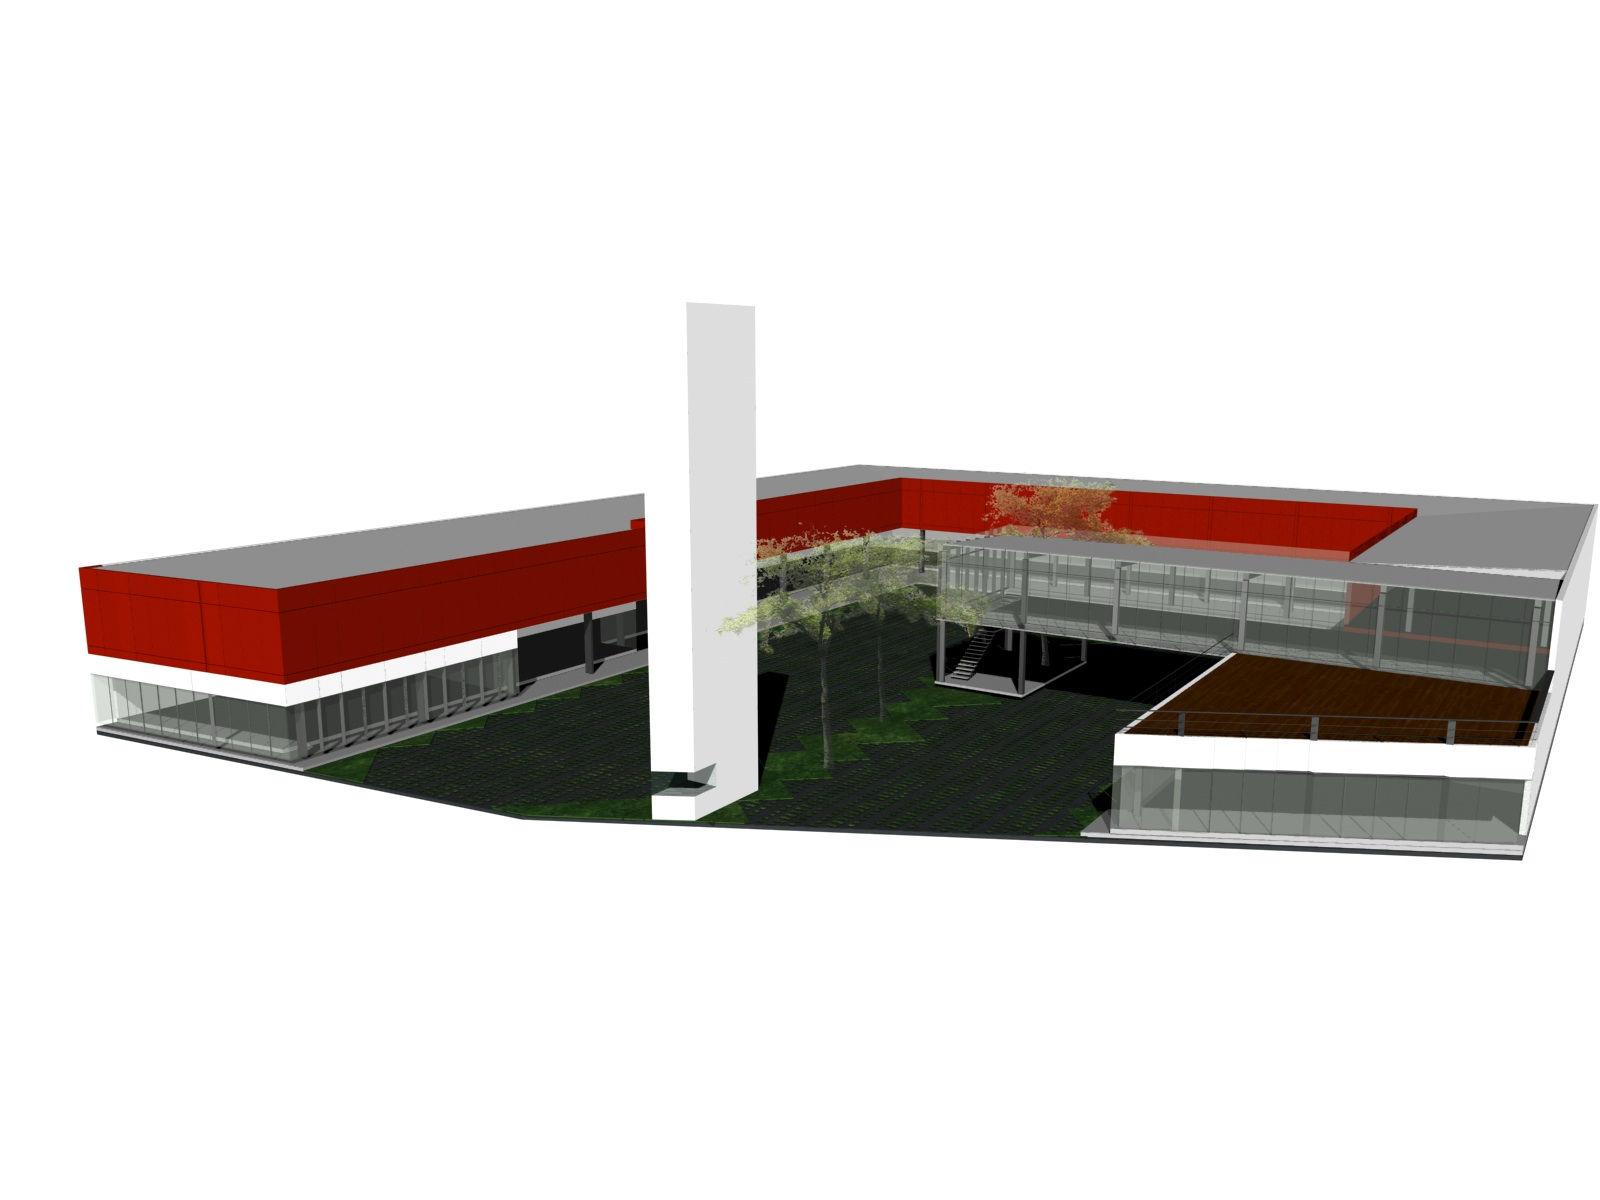 plaza lerma 2.JPG